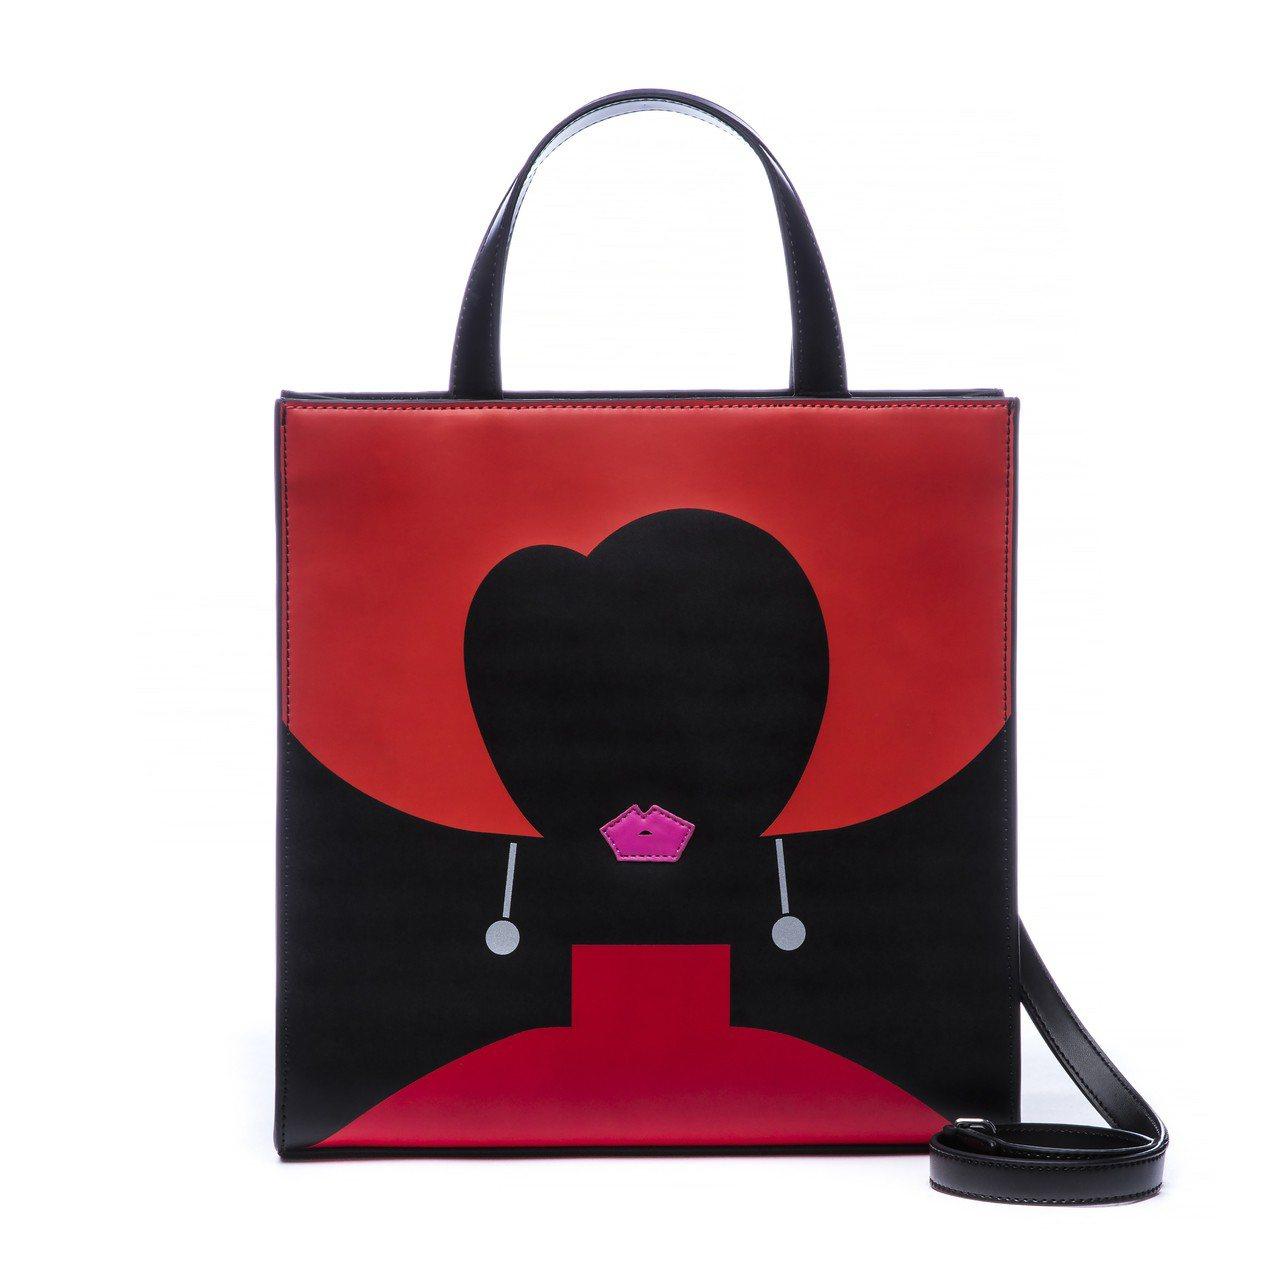 HEART FACE系列以「花樣年華」張曼玉飾演的蘇麗珍作為設計主題,手提包14...